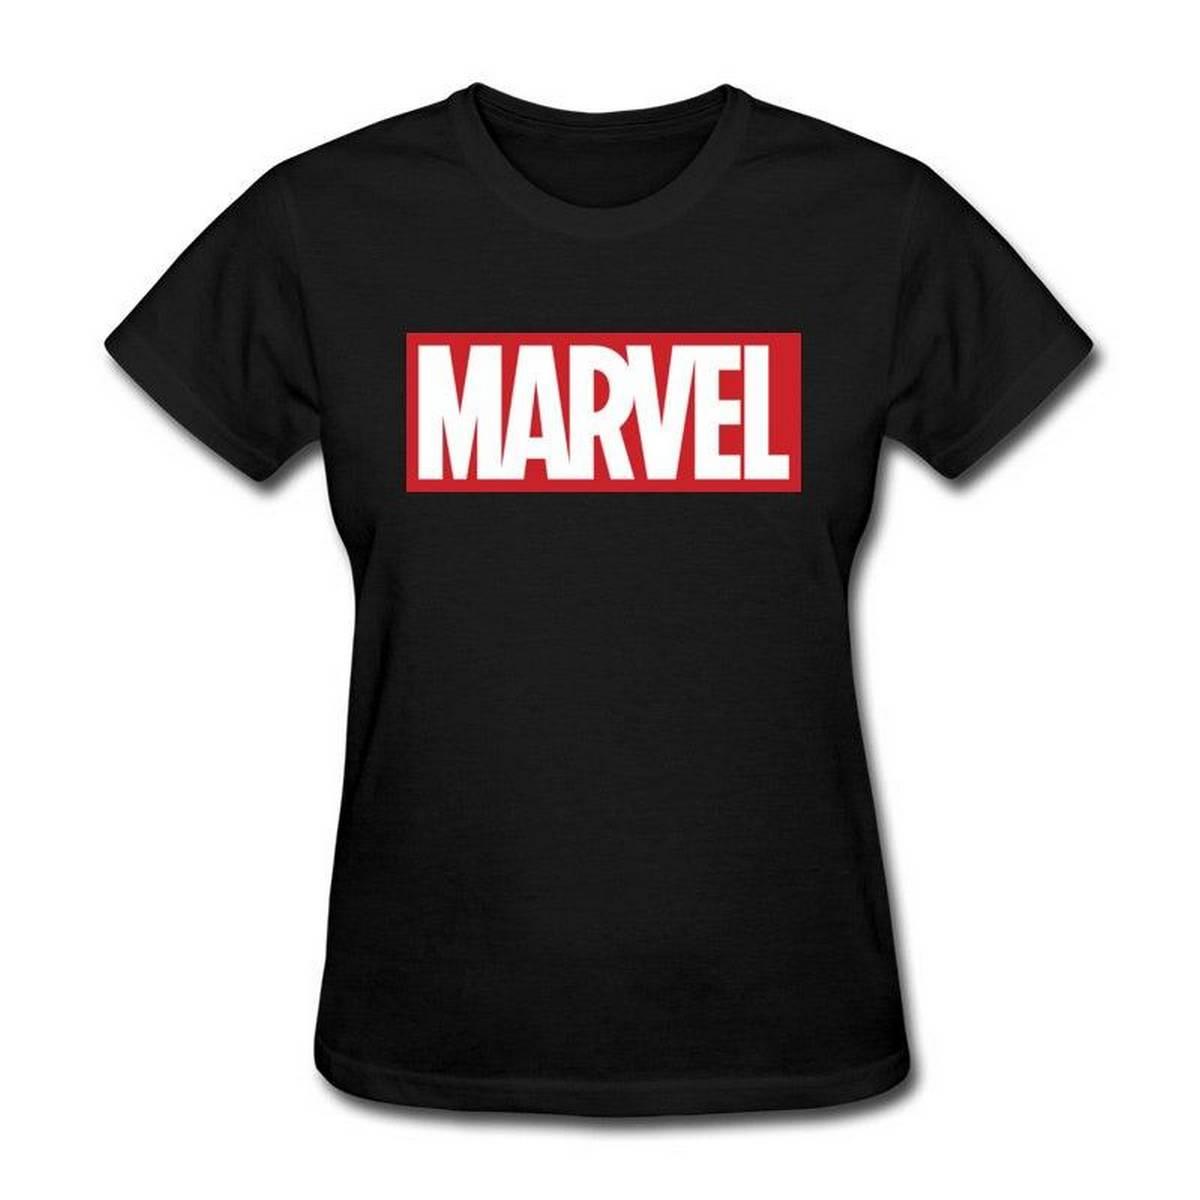 Women Tshirt Marvel Fashion New Tops T-Shirt Good Quality Full Cotton Clothing Summer T Shirt Hot Trendy